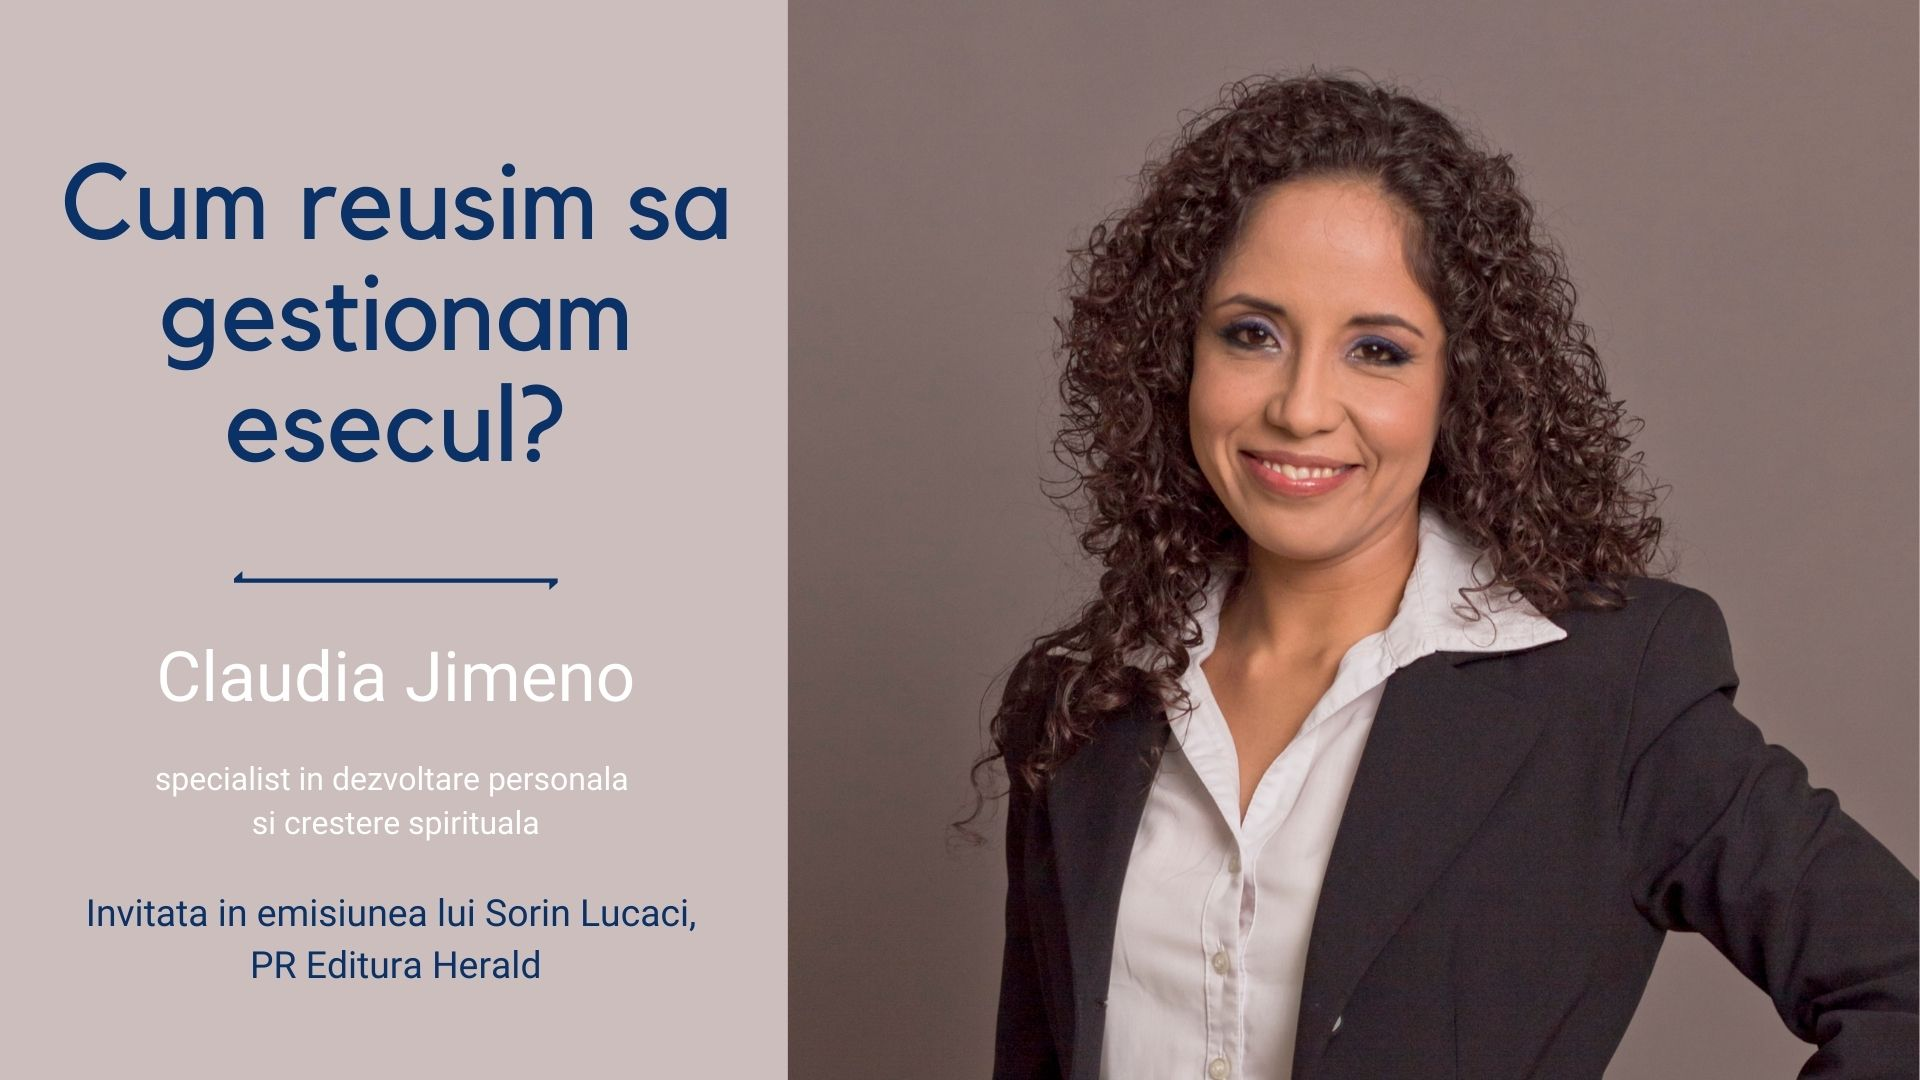 cum-reusim-sa-gestionam-esecul-Claudia-Jimeno-Sorin-Lucaci-Editura-Herald